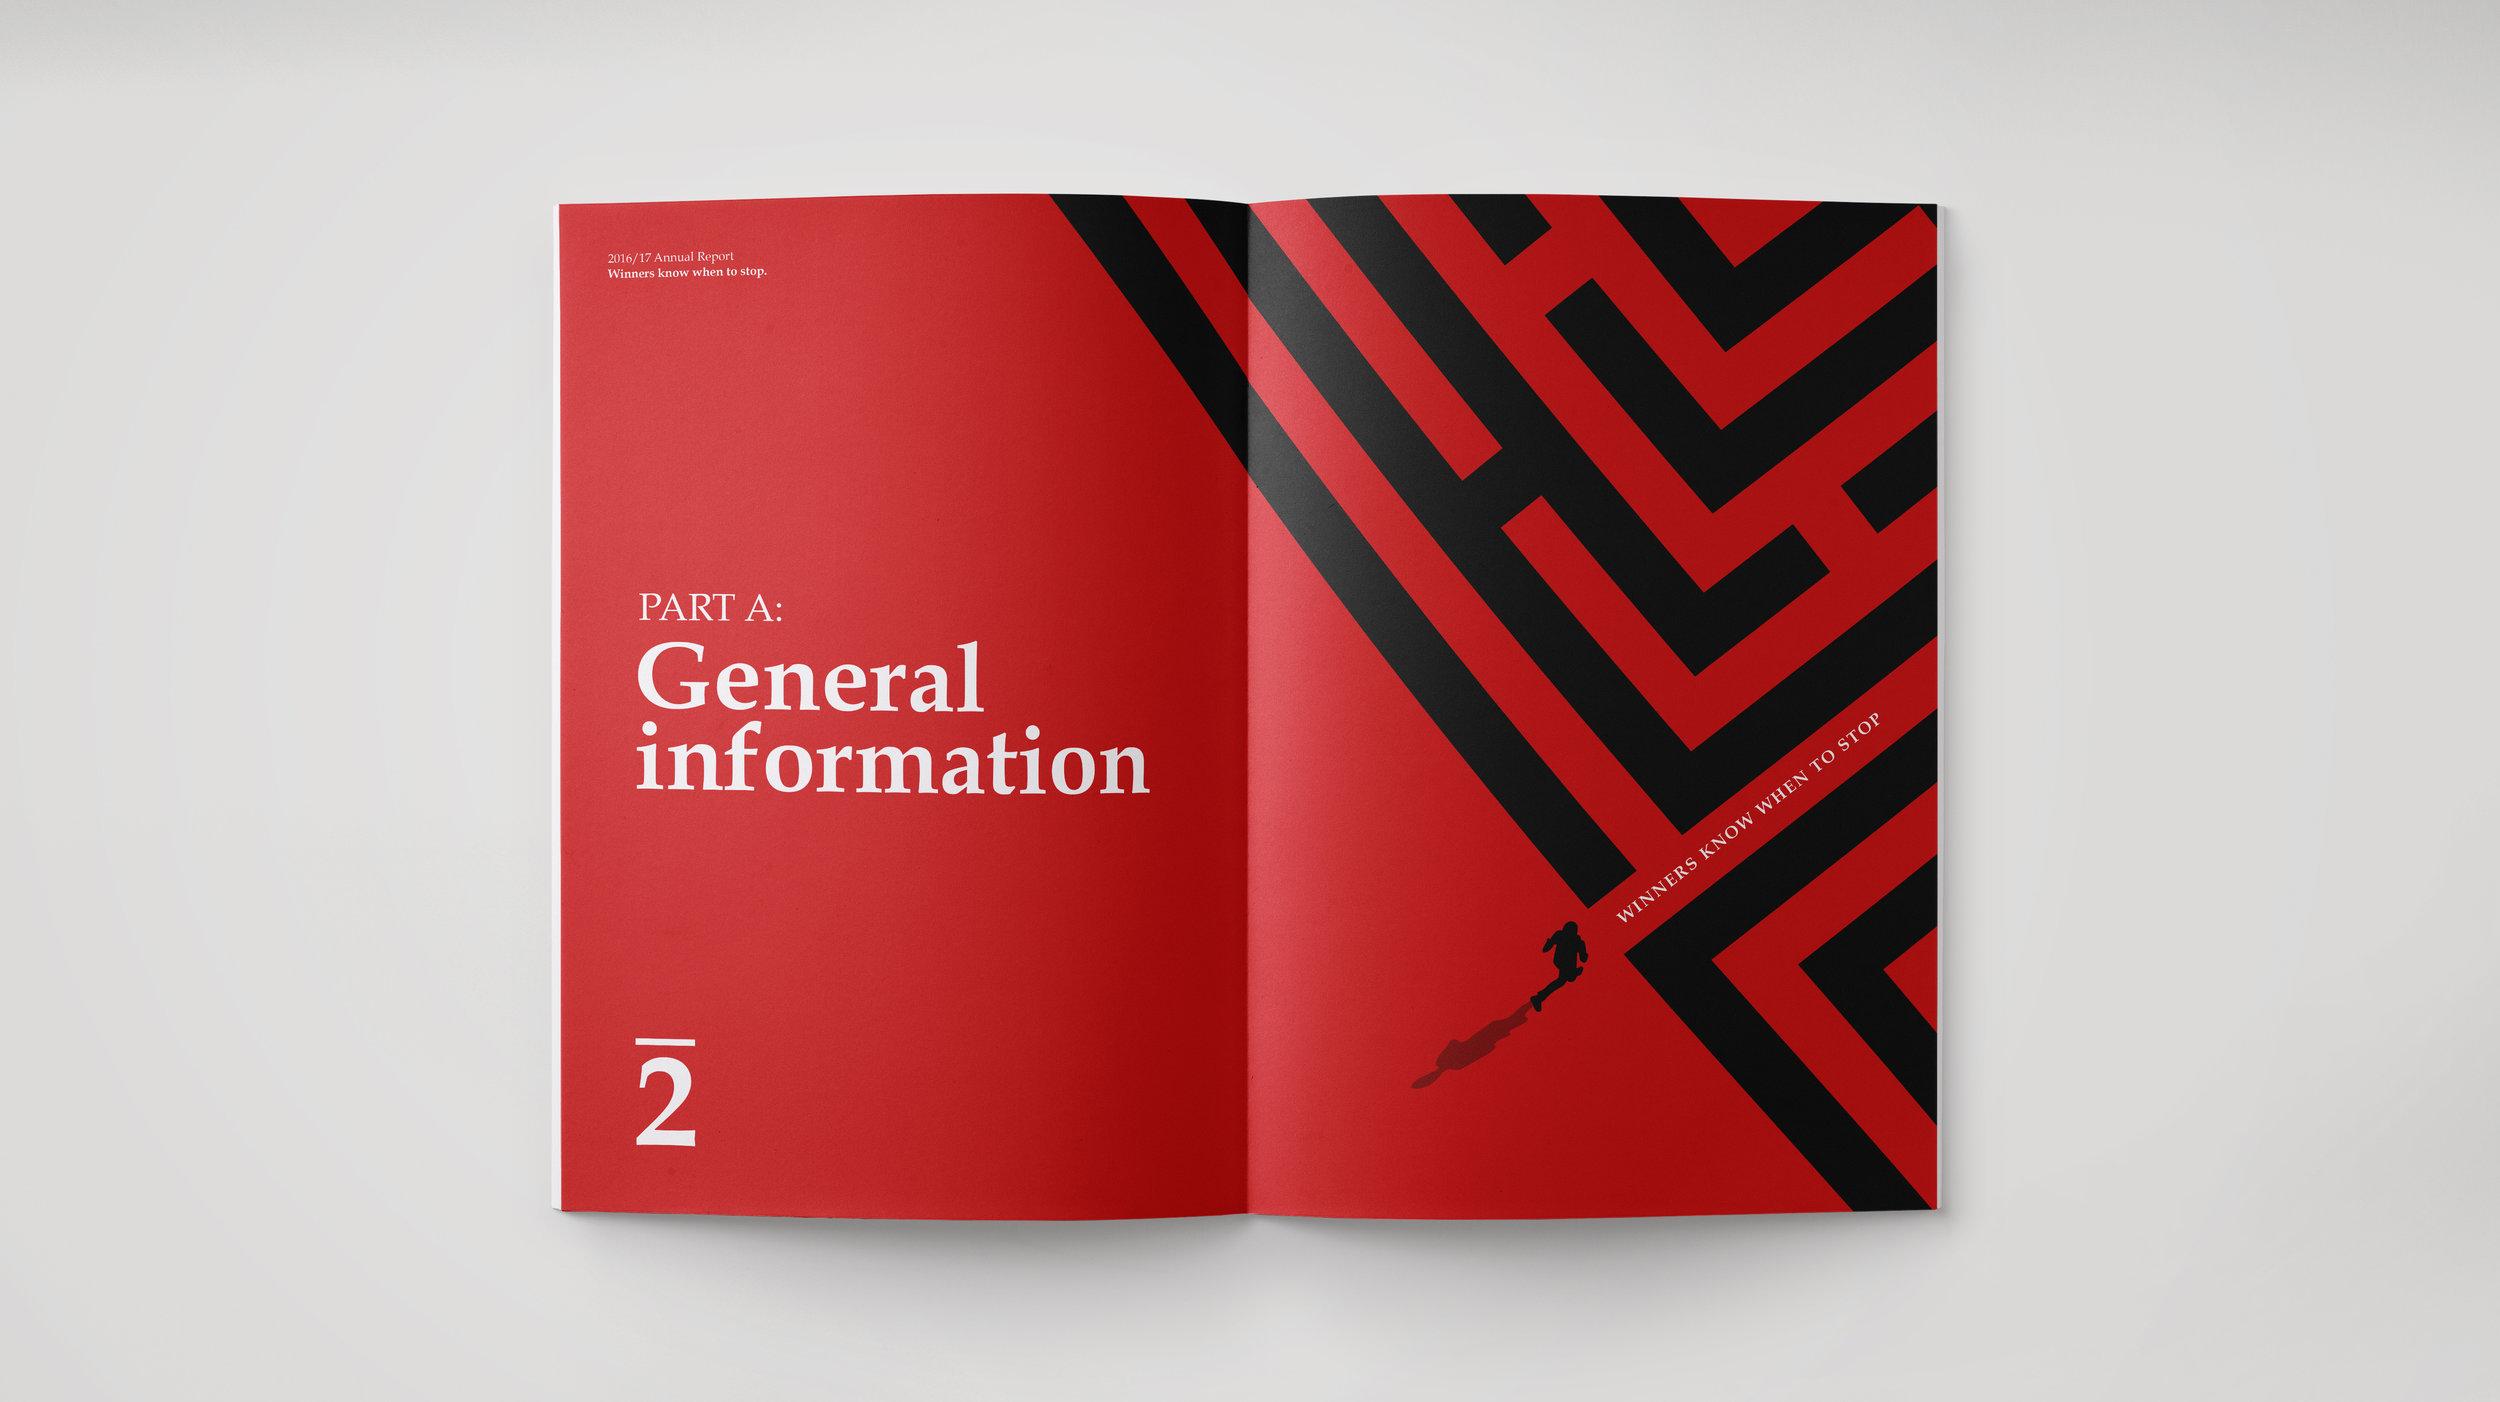 SARGF - Annual Report spread 02.jpg